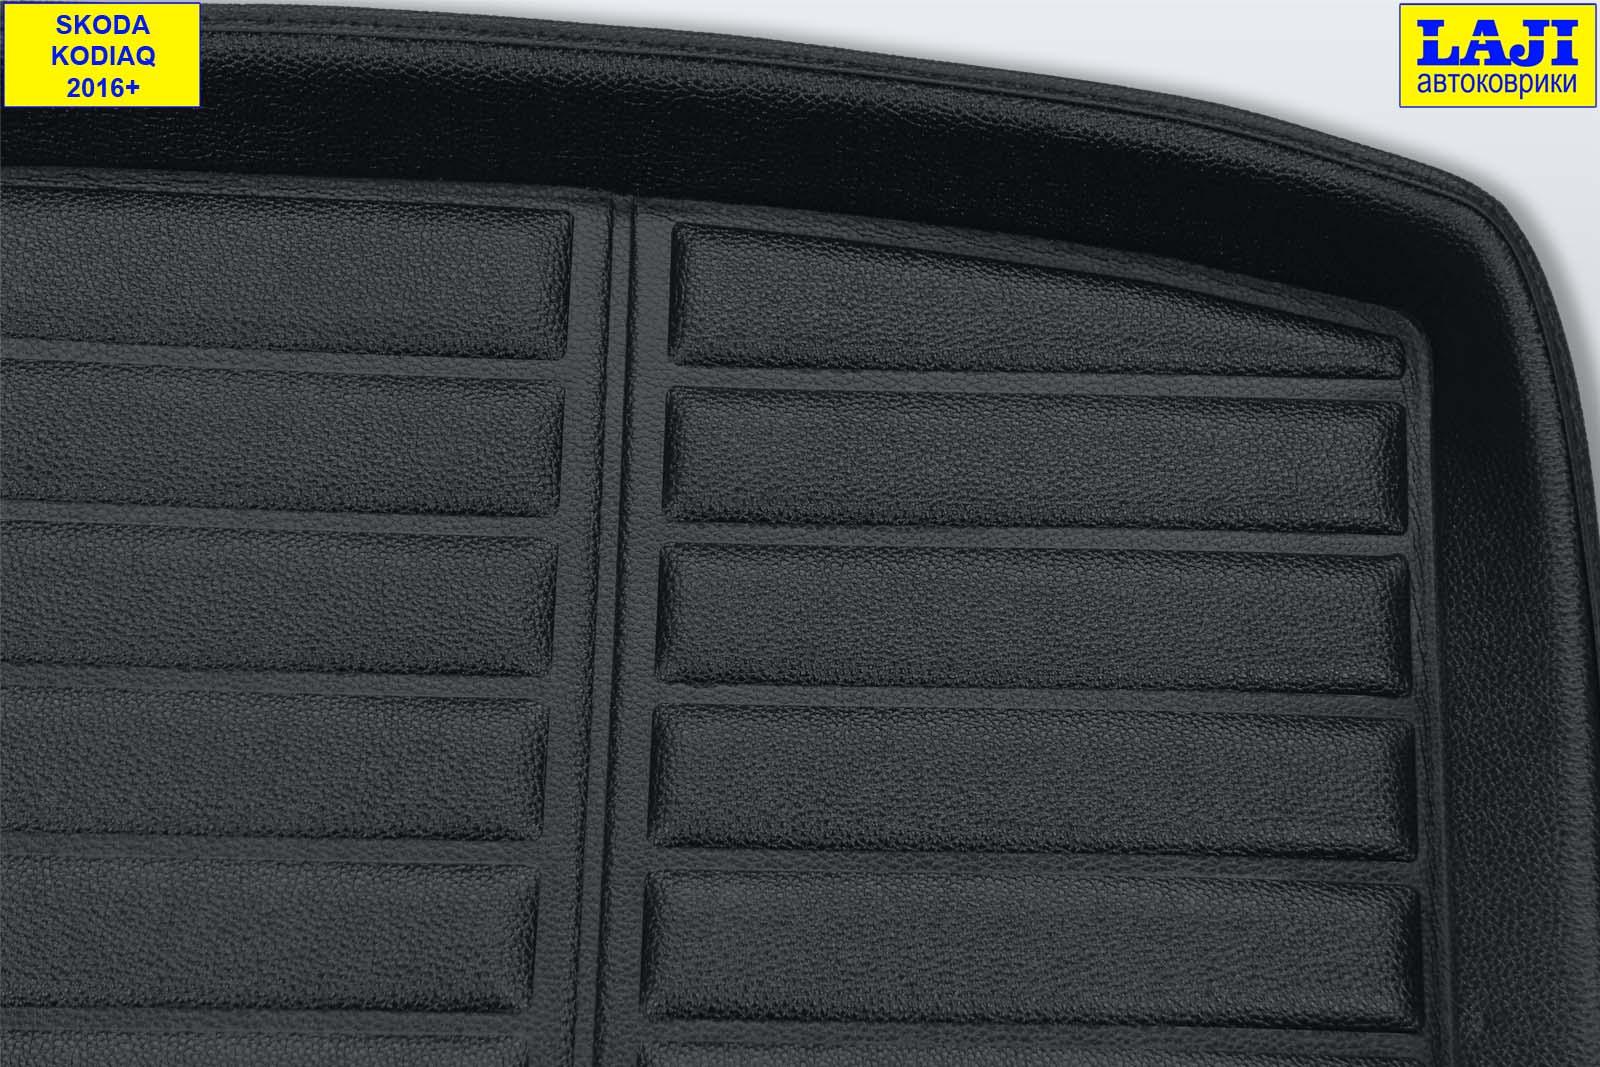 3D коврик в багажник Skoda Kodiaq 2016-н.в. 3